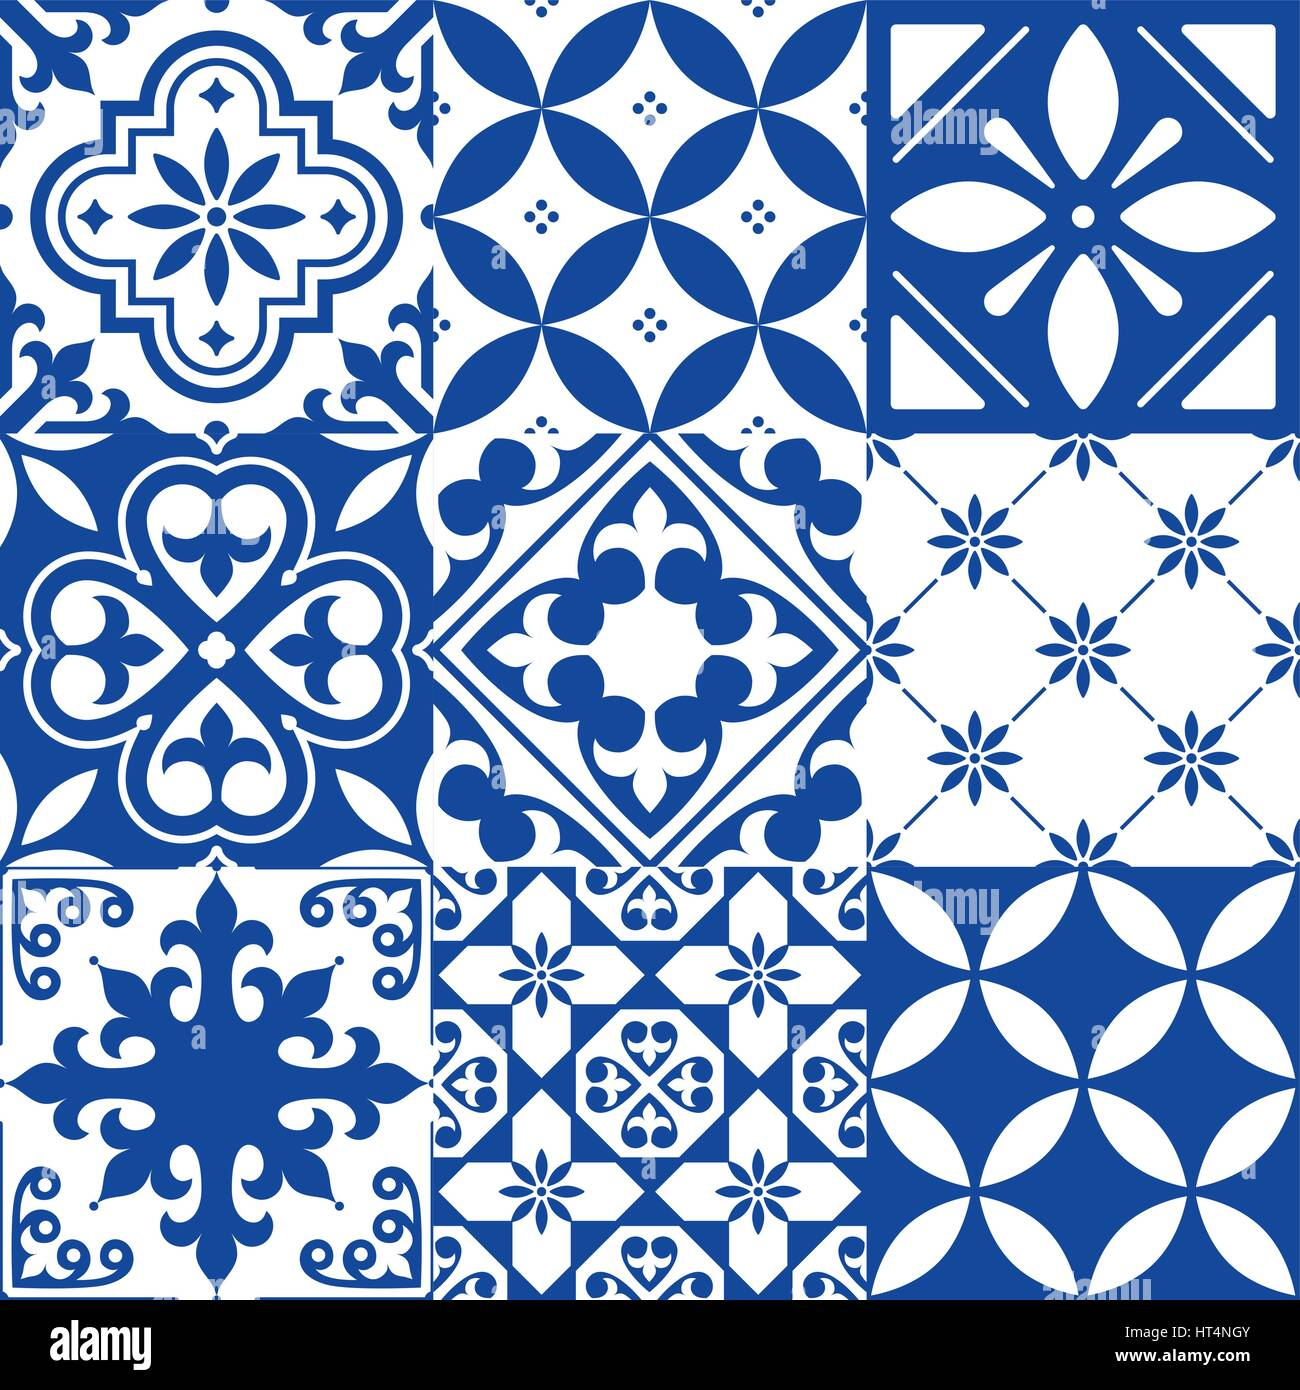 https www alamy com stock photo spanish tiles moroccan tiles design seamless navy blue pattern 135329067 html